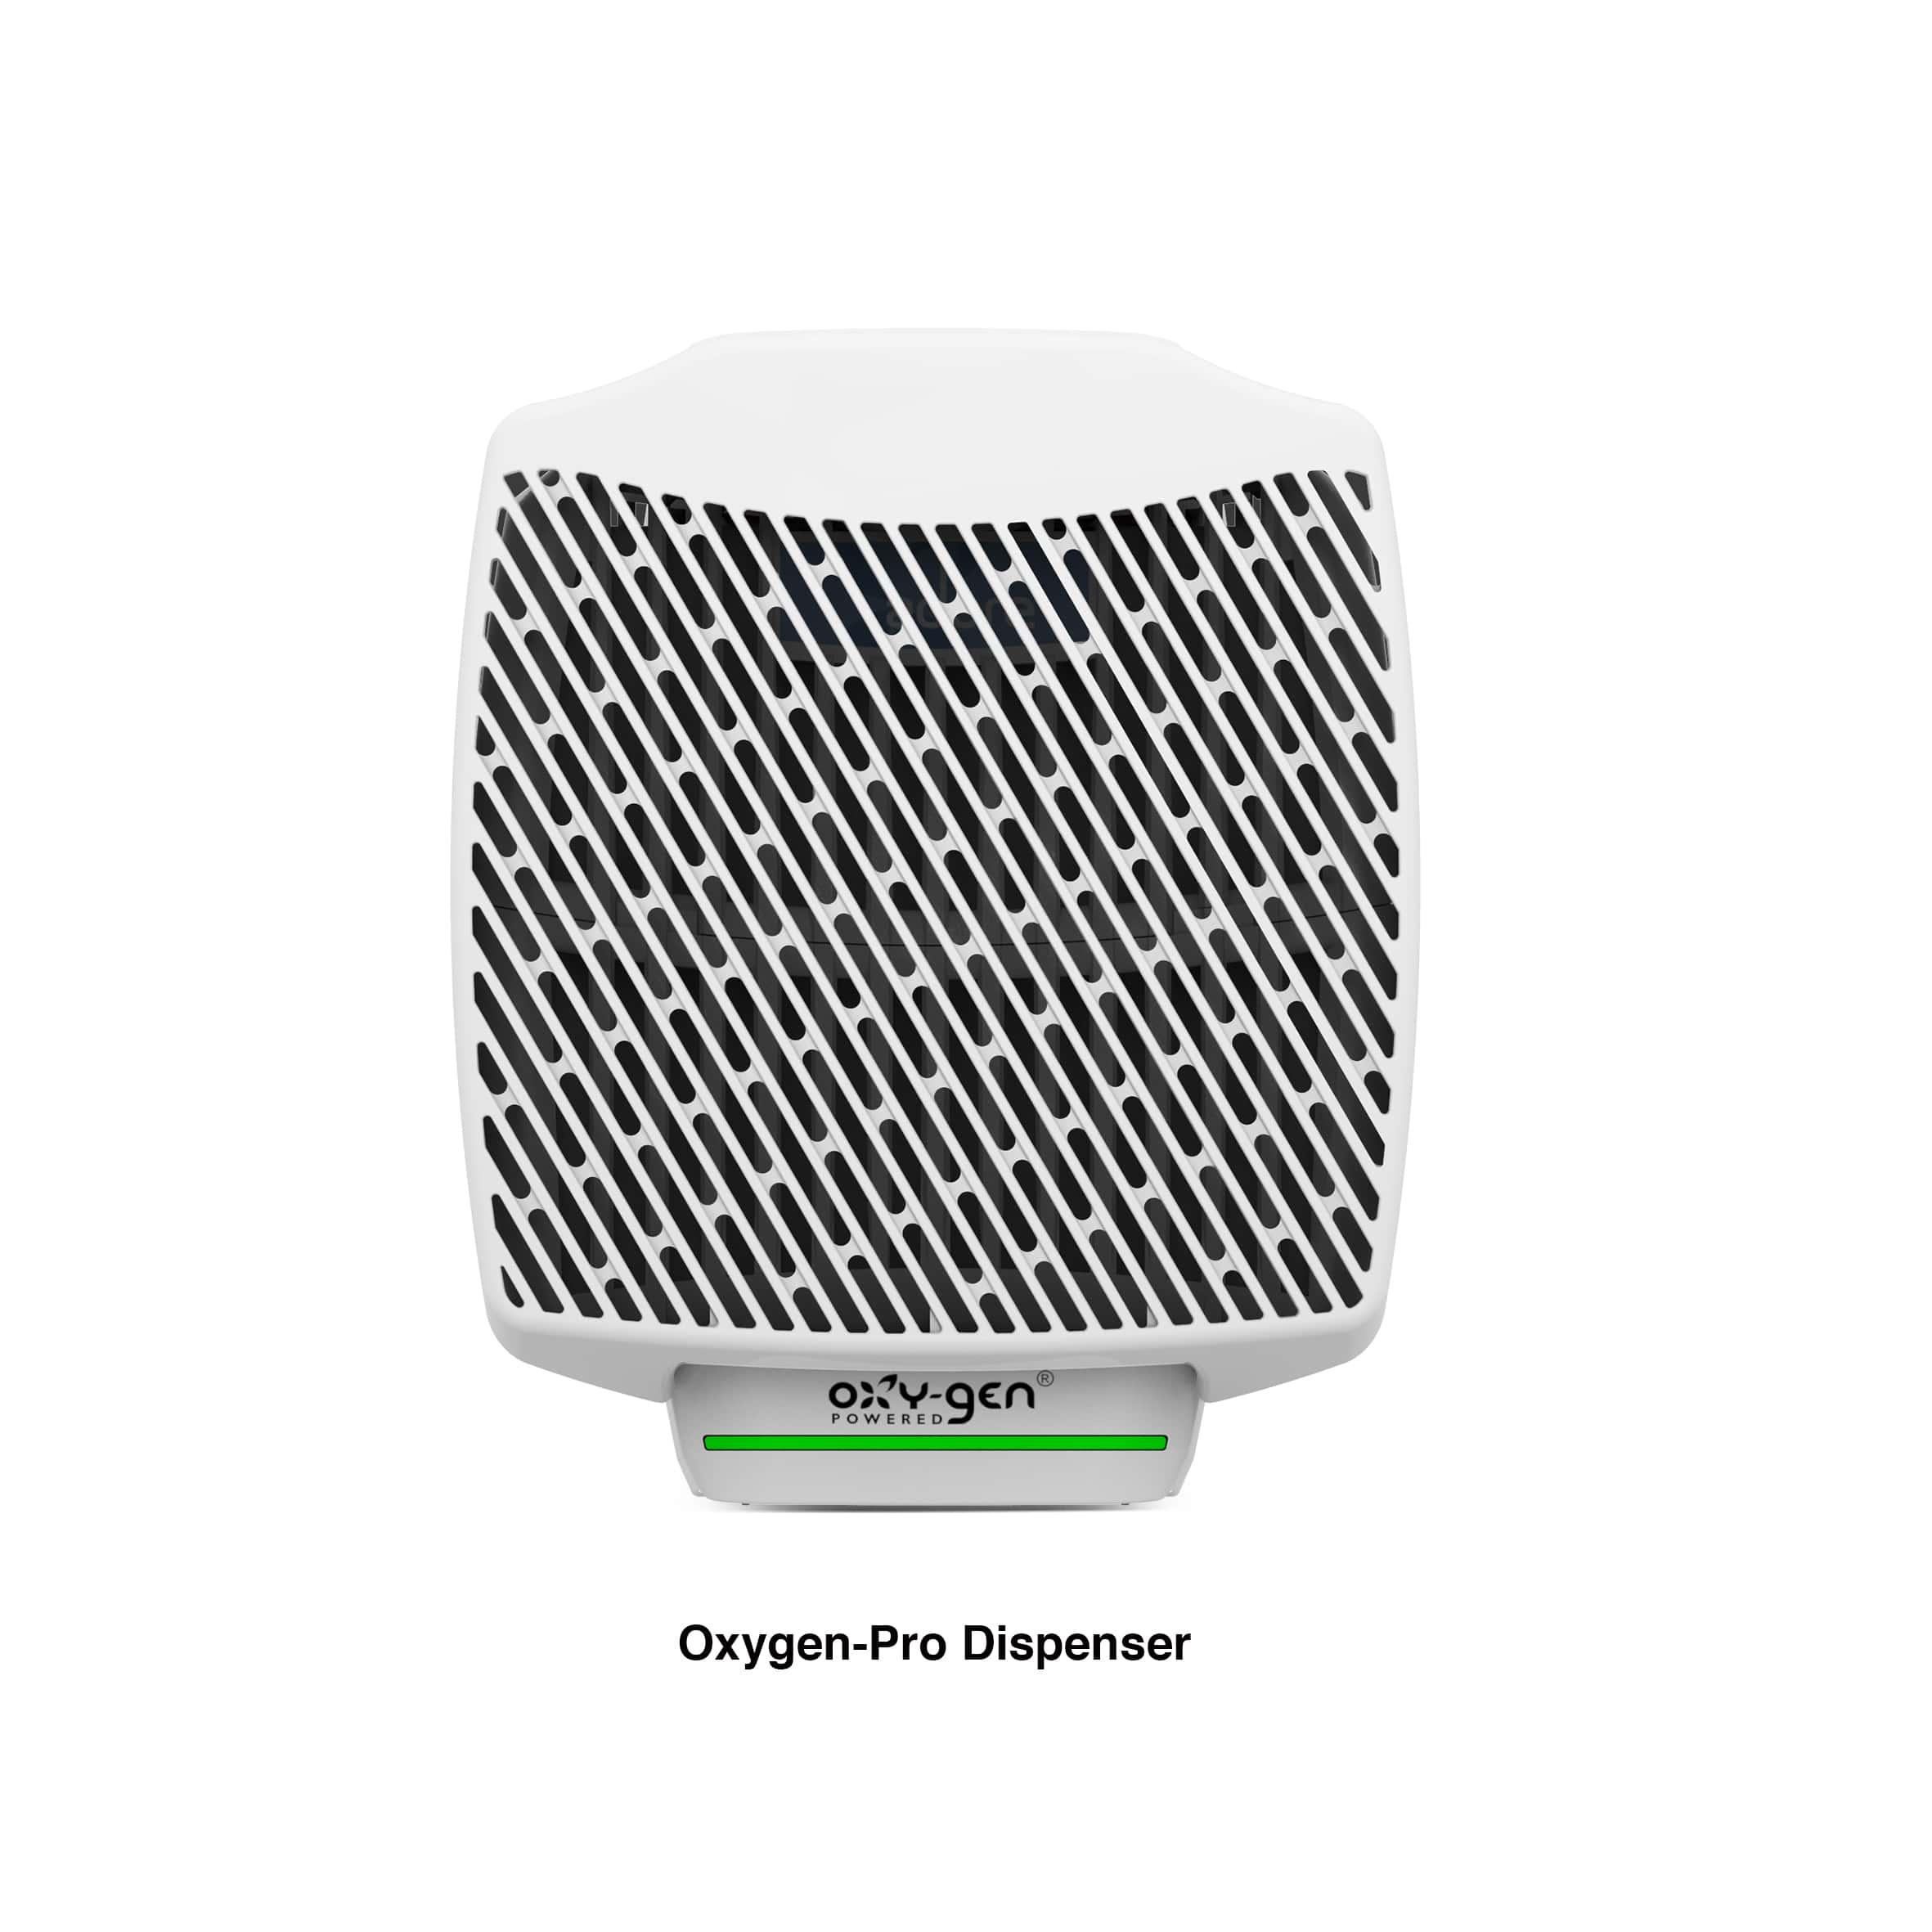 Oxygen Air Freshener - Pro